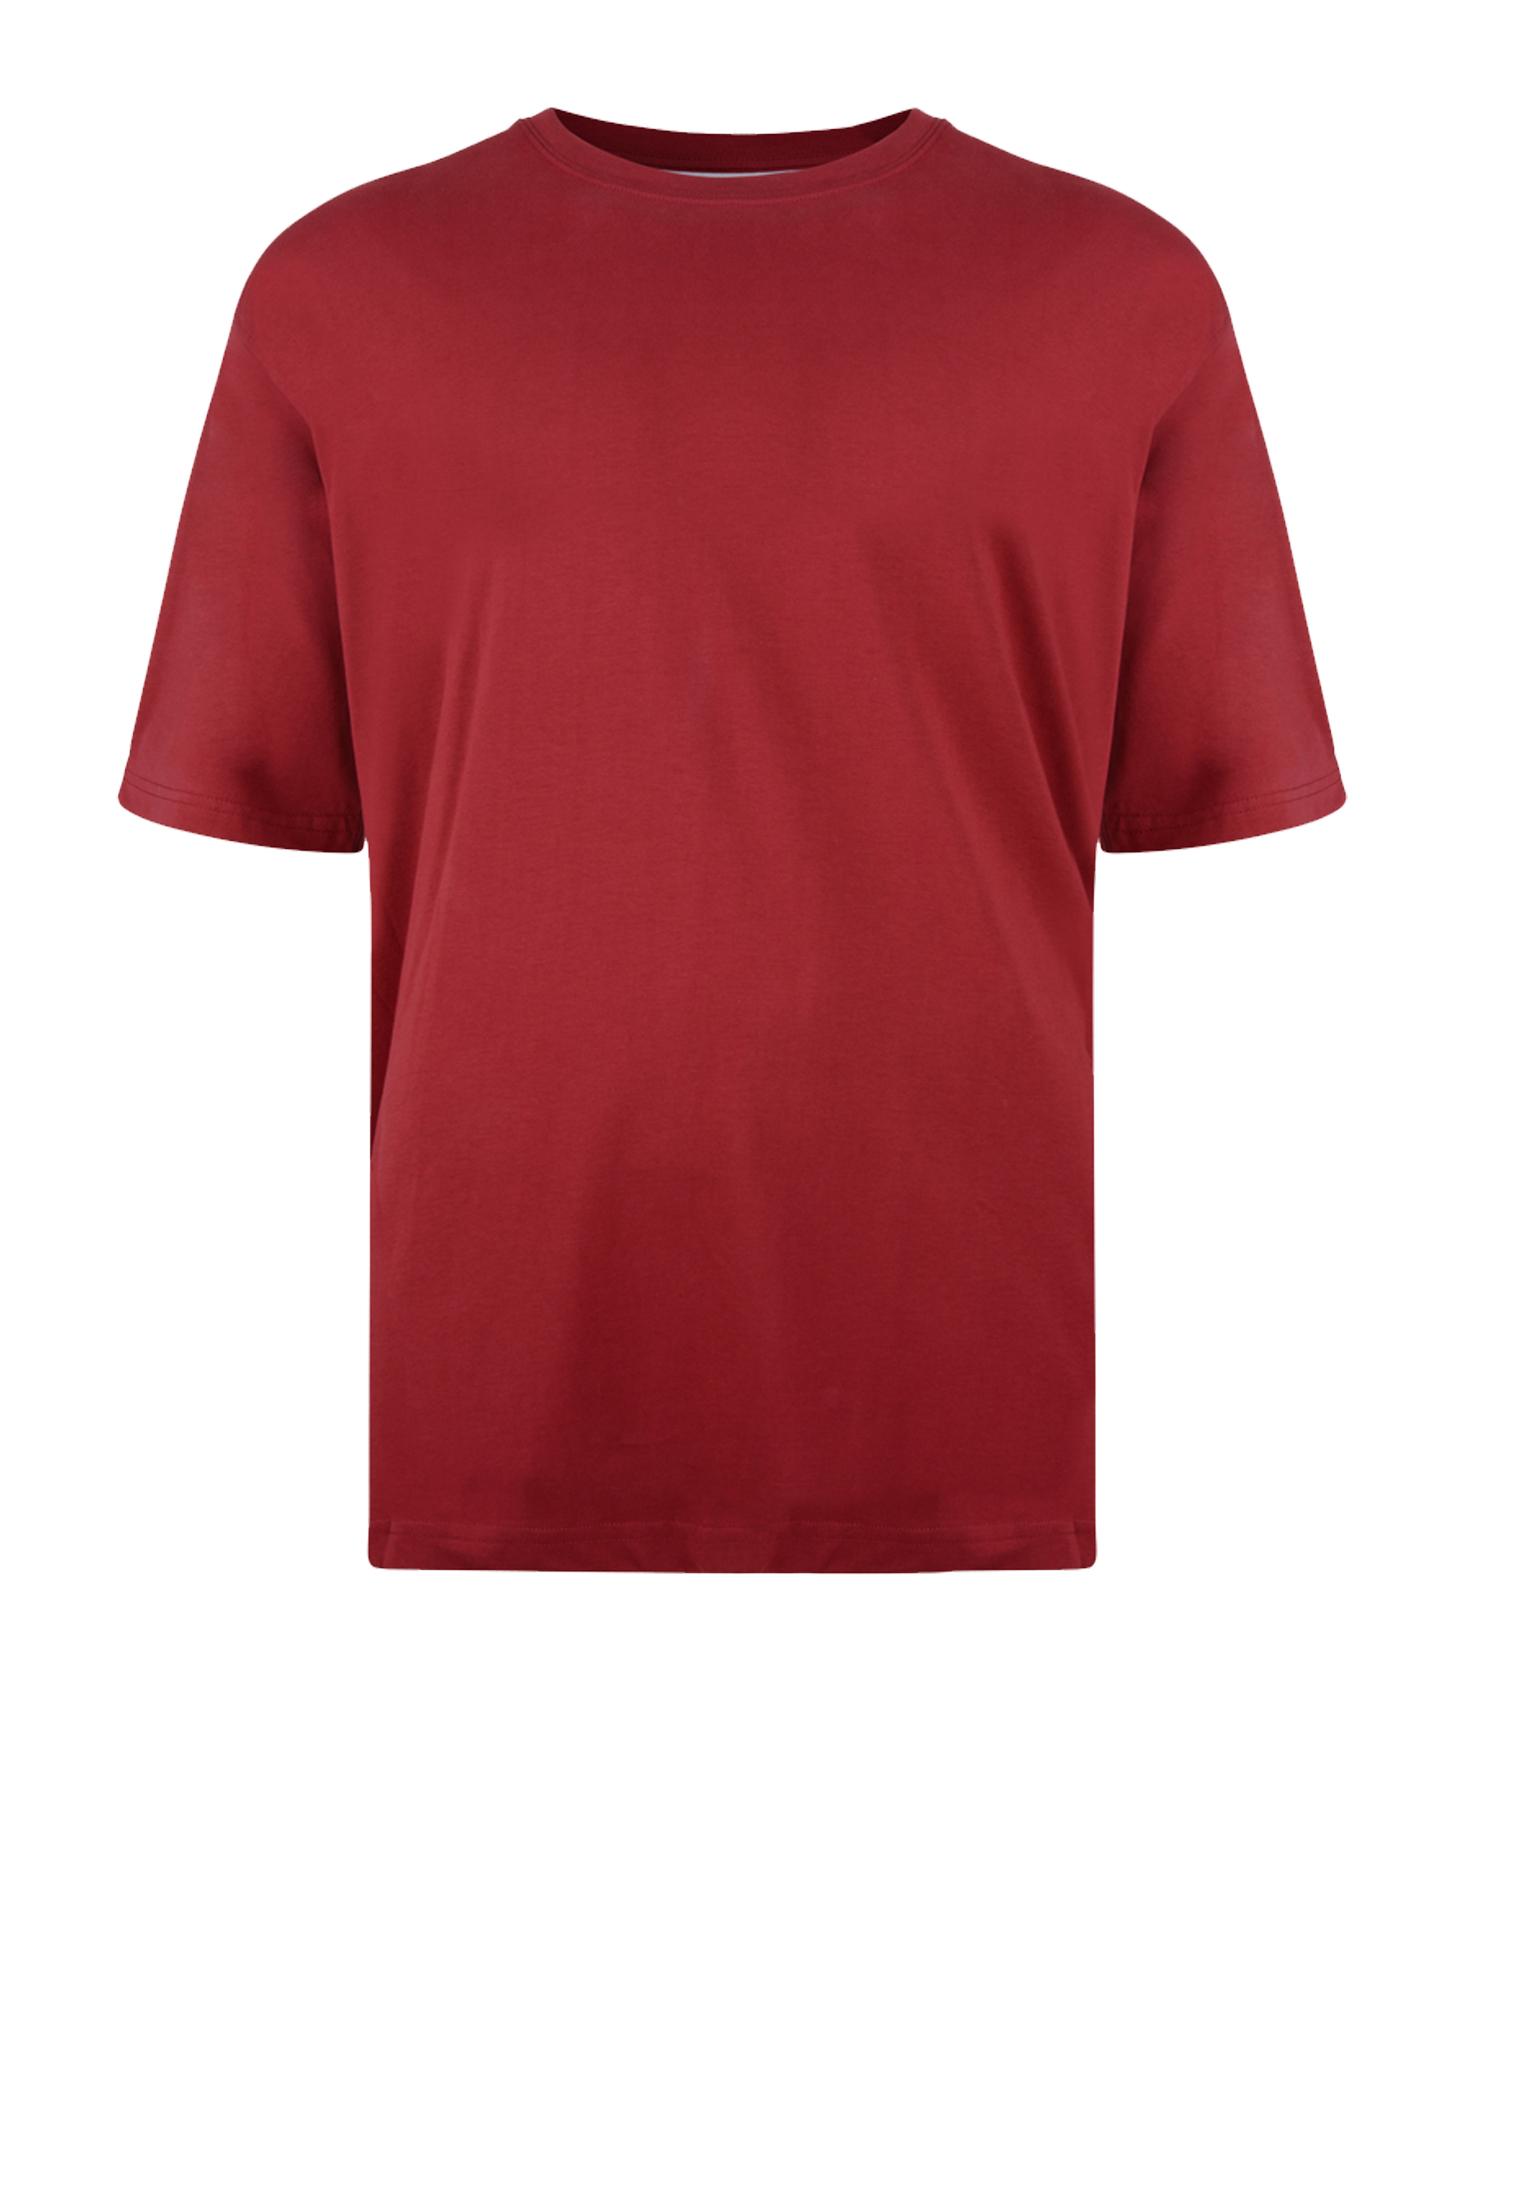 KAM JEANSWEAR effen kleur t-shirt met ronde hals in de kleur bordeaux rood.